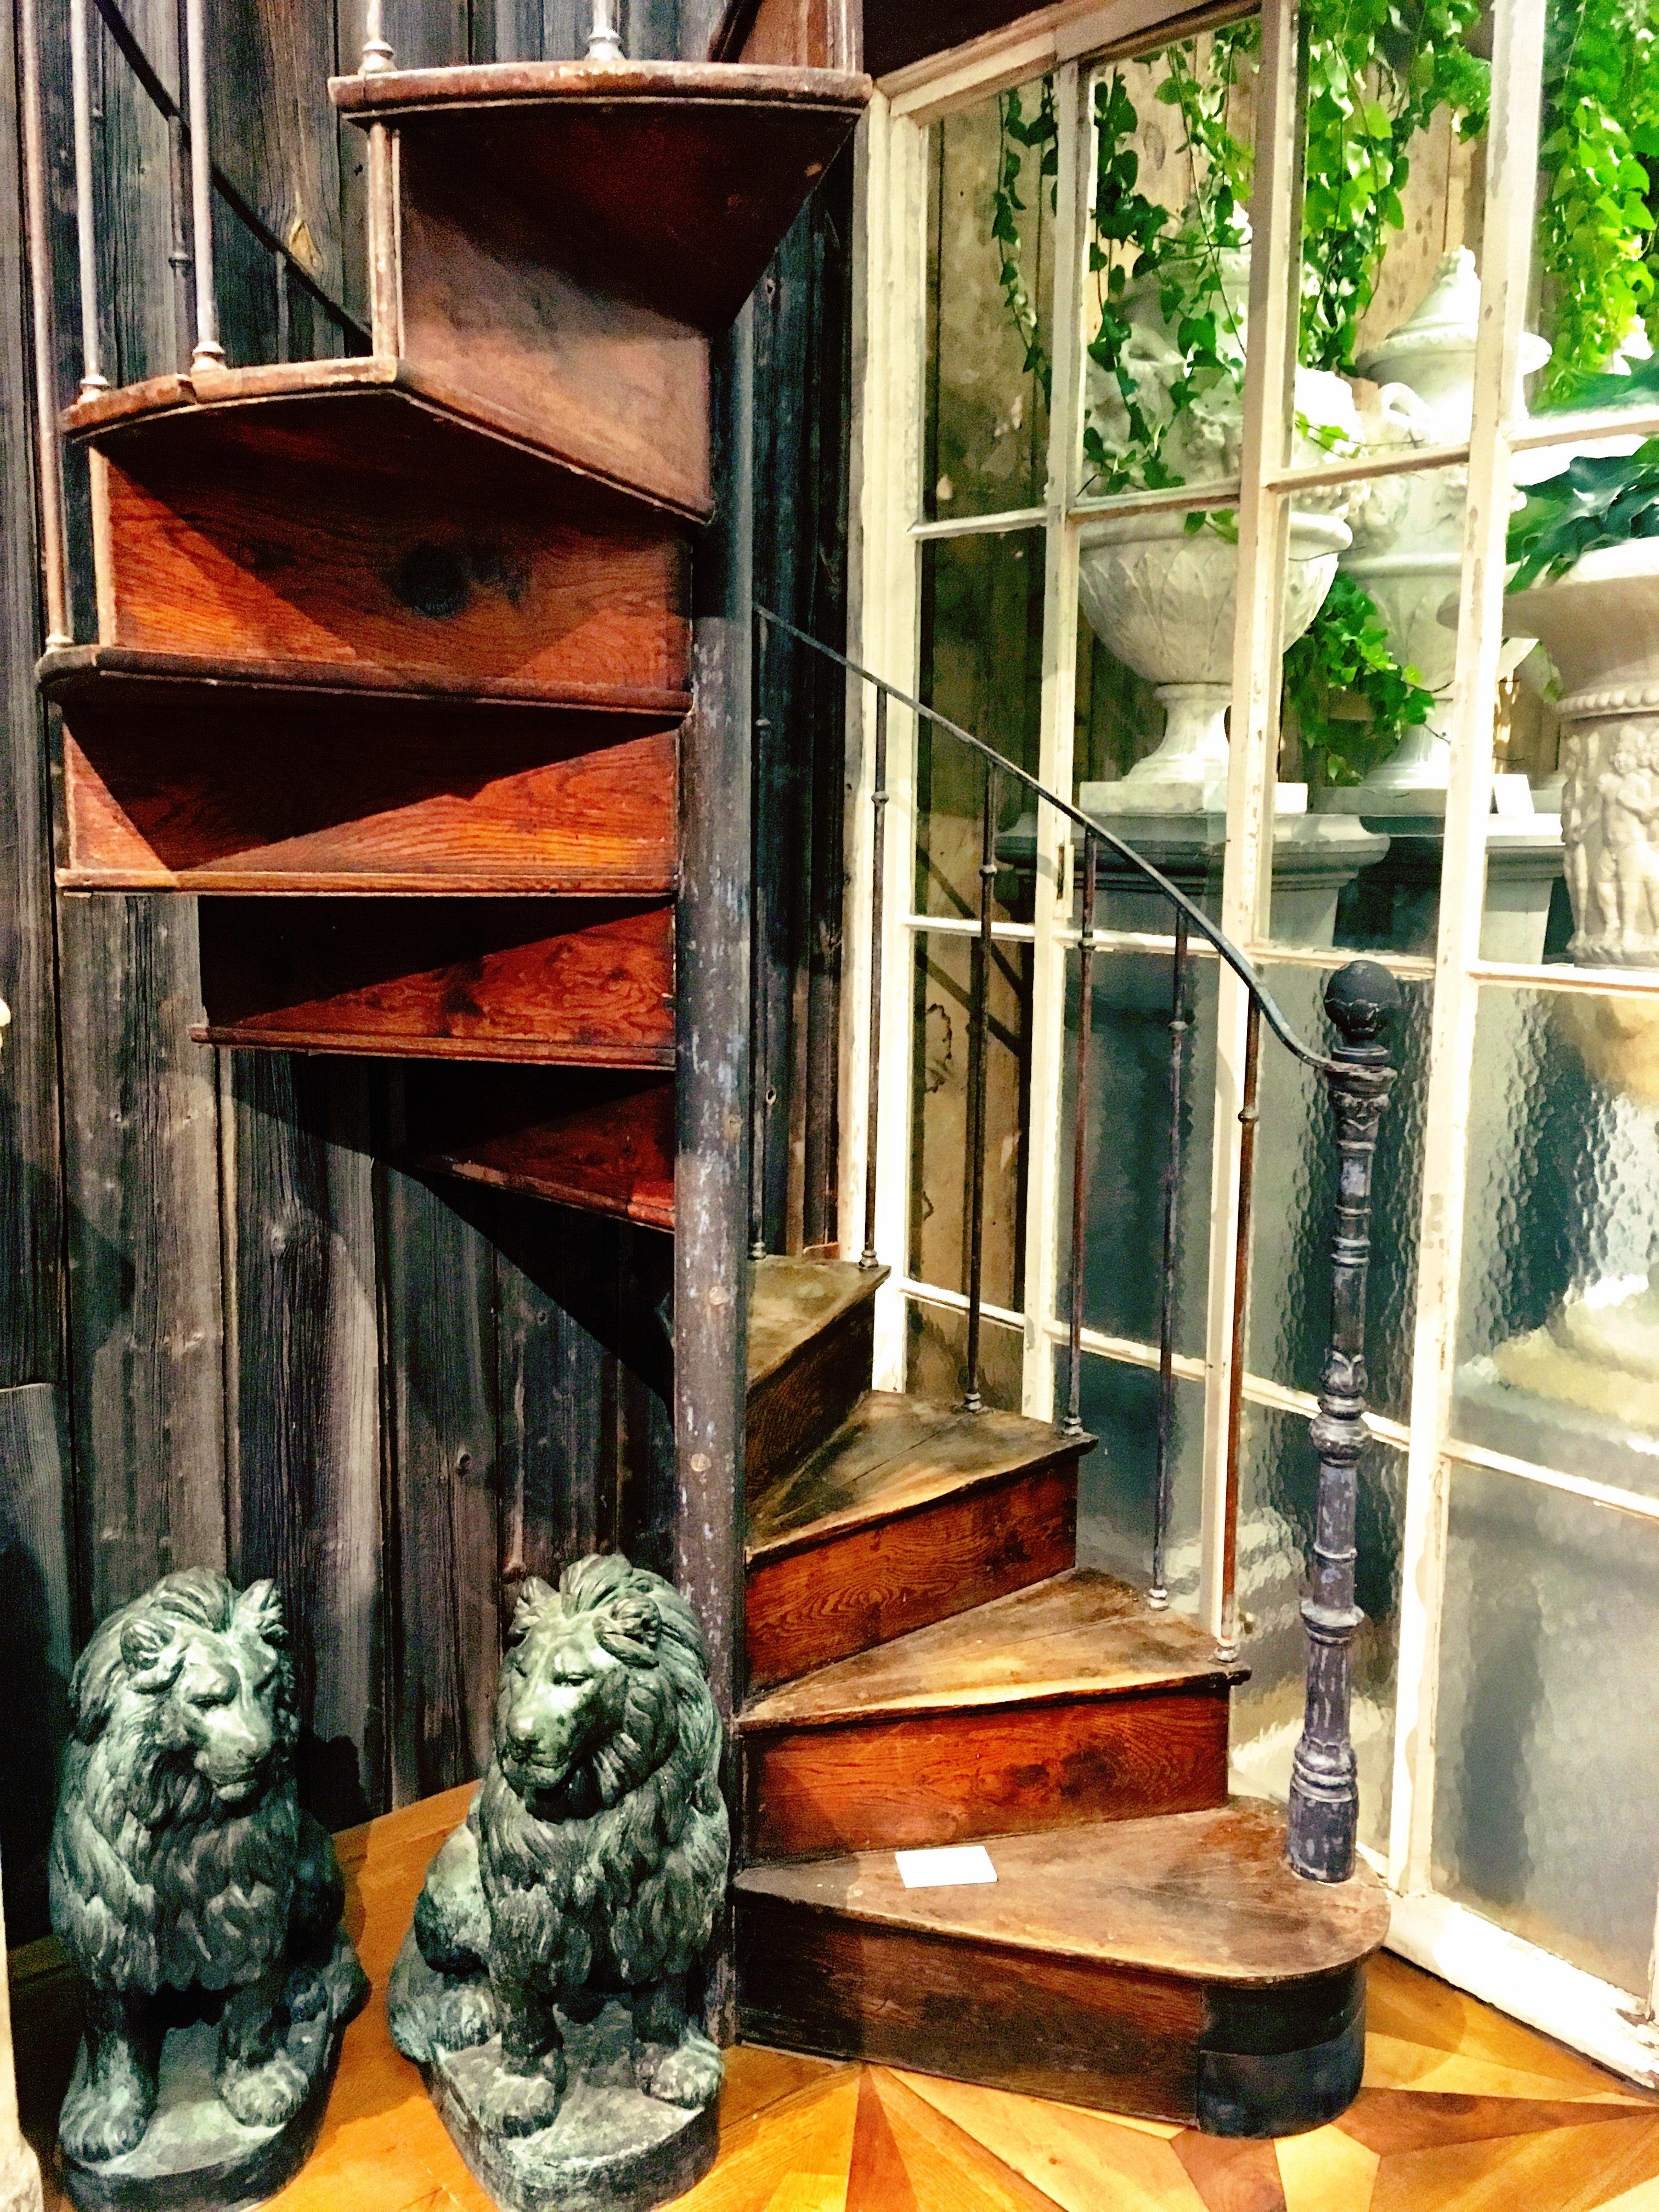 piet jonker architectural antiques - - 1stdibs